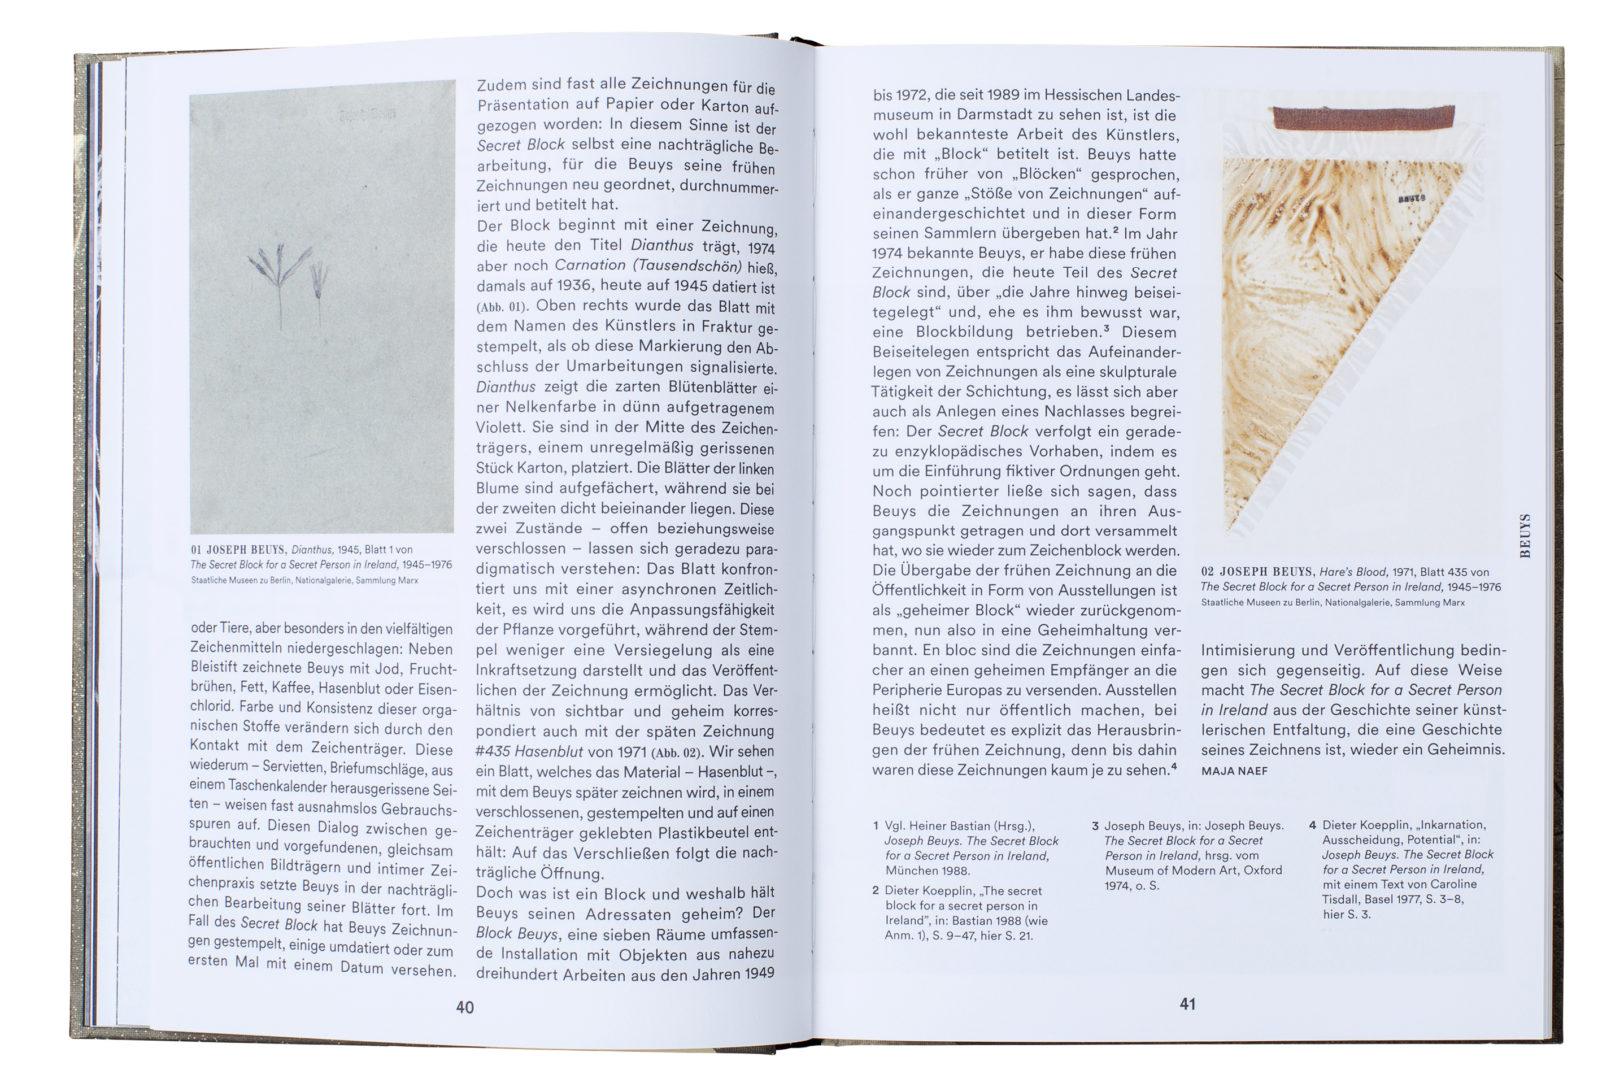 http://e-o-t.de/wordpress/wp-content/uploads/2020/06/Books-Marx-eot14.jpg